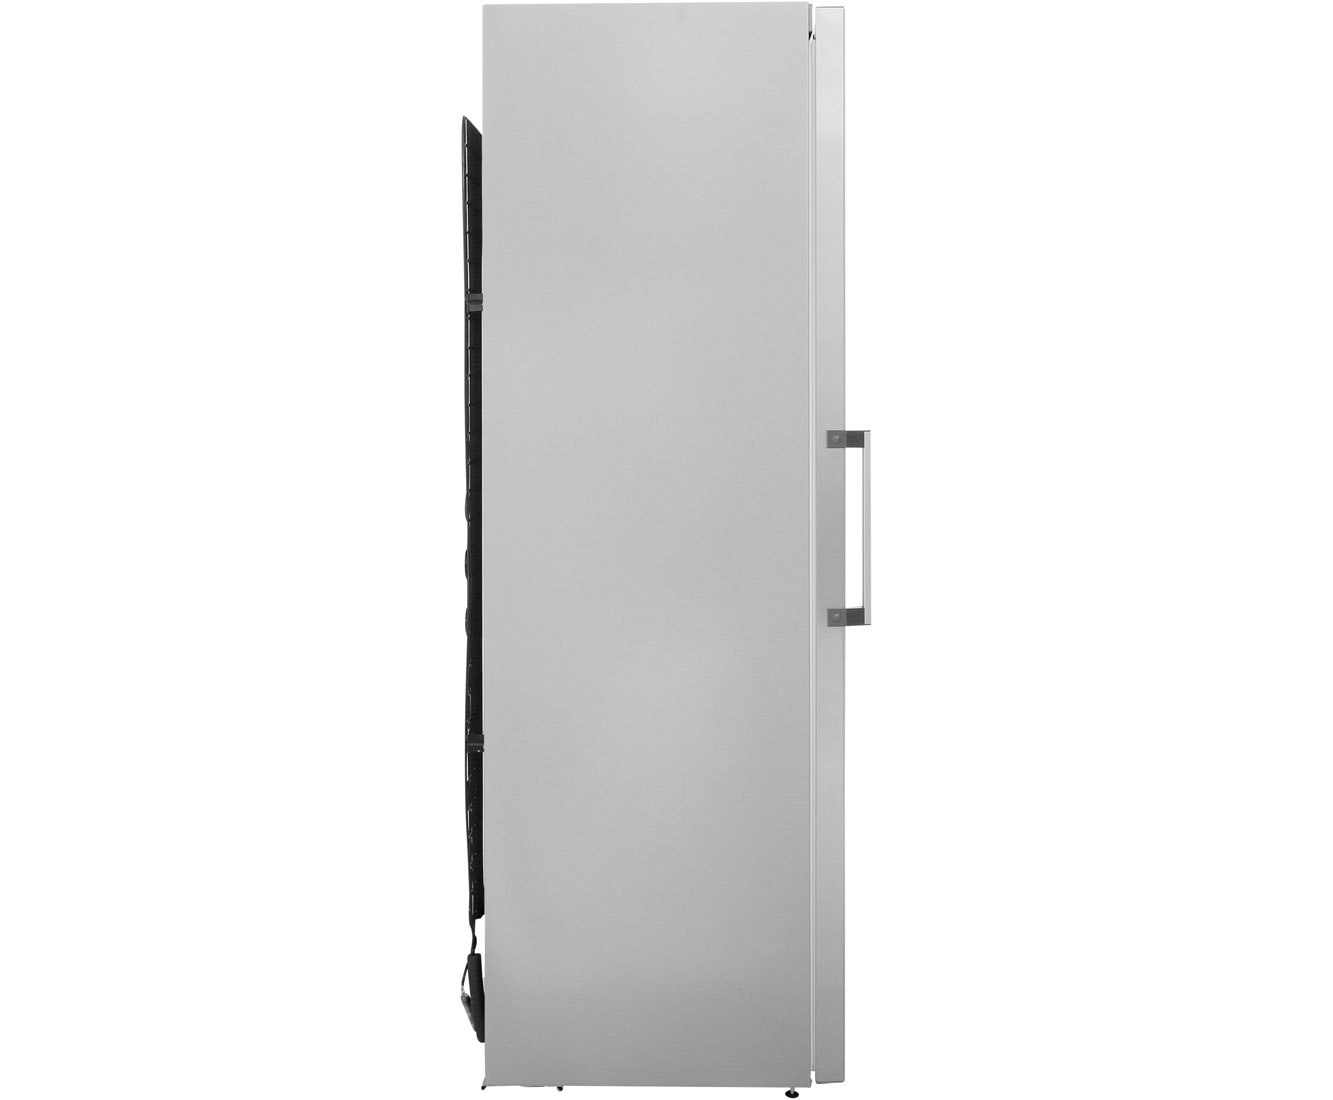 Bomann Kühlschrank Günstig : Bomann kühlschrank roller: bomann vollraum kühlschrank vs 354 von